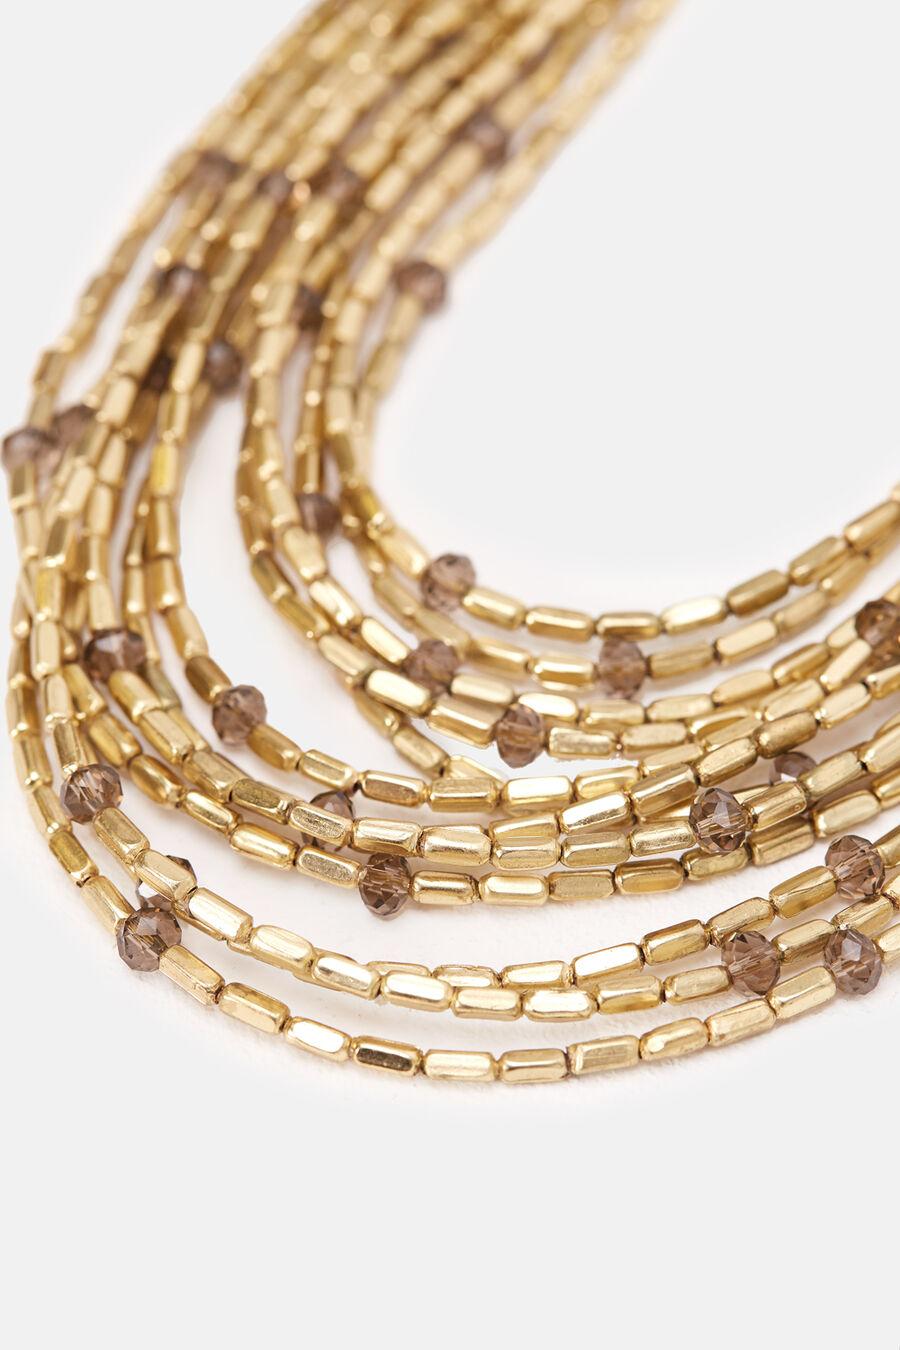 Multichain necklace